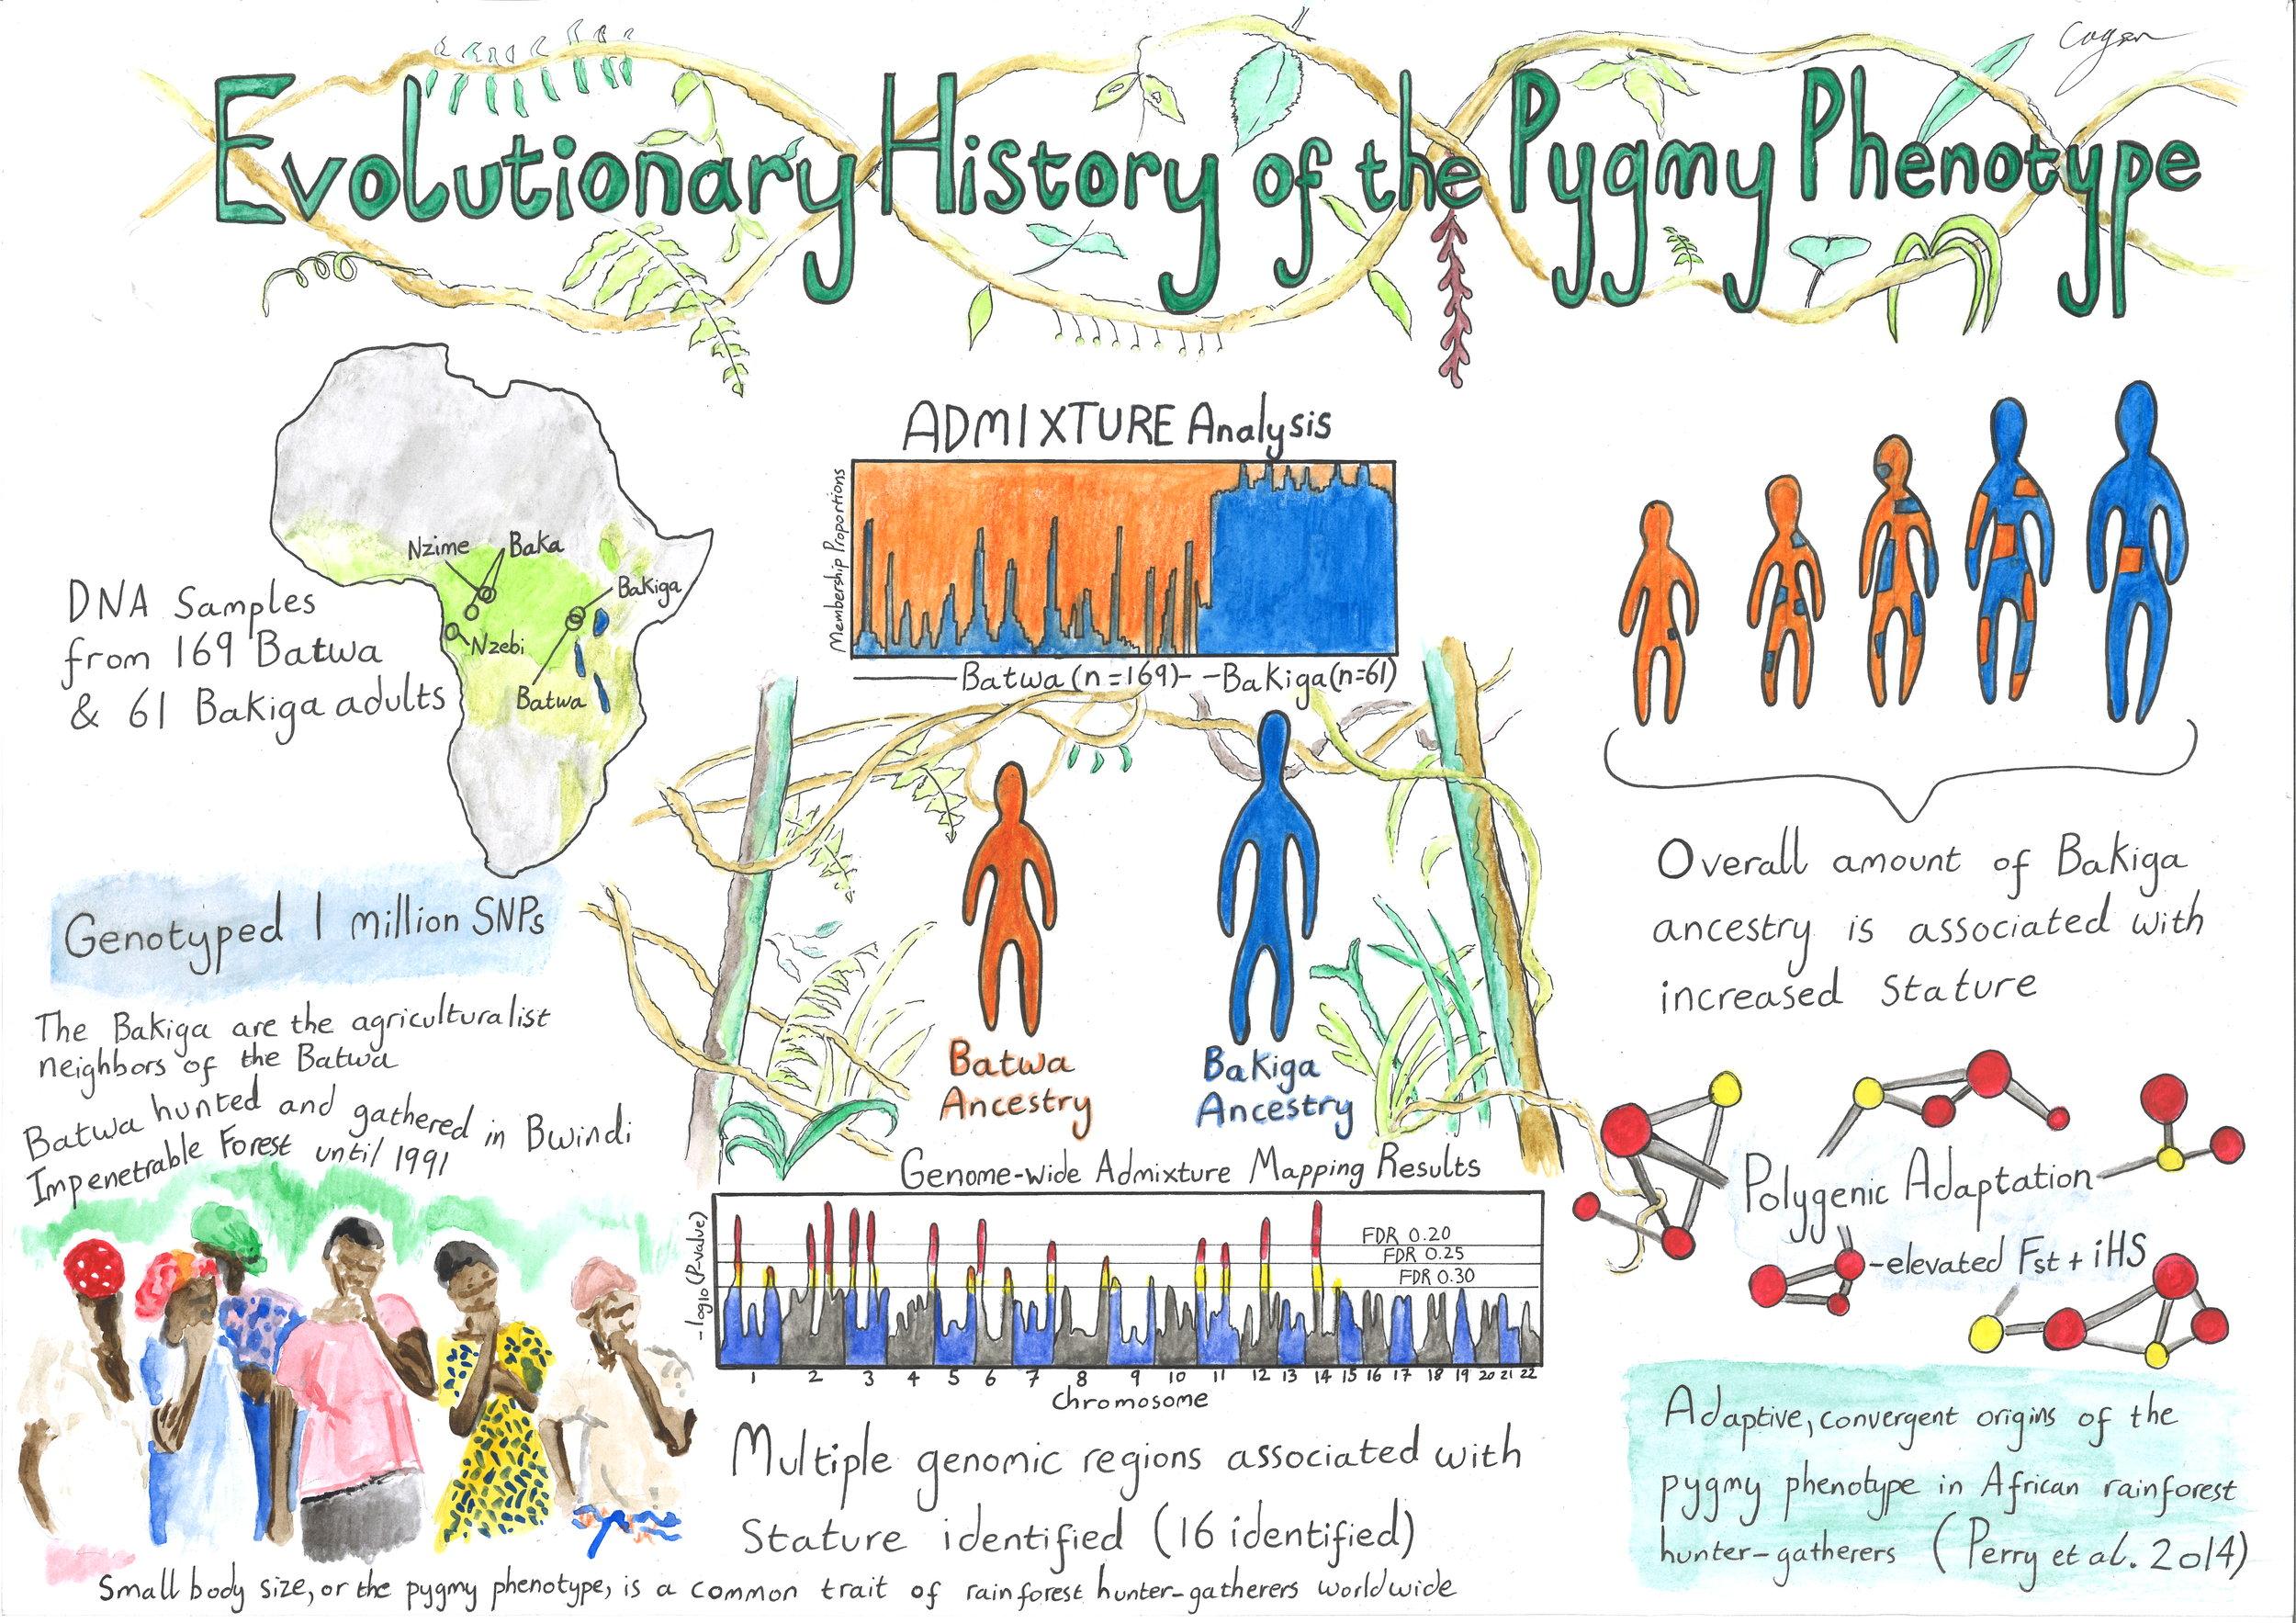 Cagan illustration of Perry et al. 2014 (Batwa pygmy phenotype).jpg